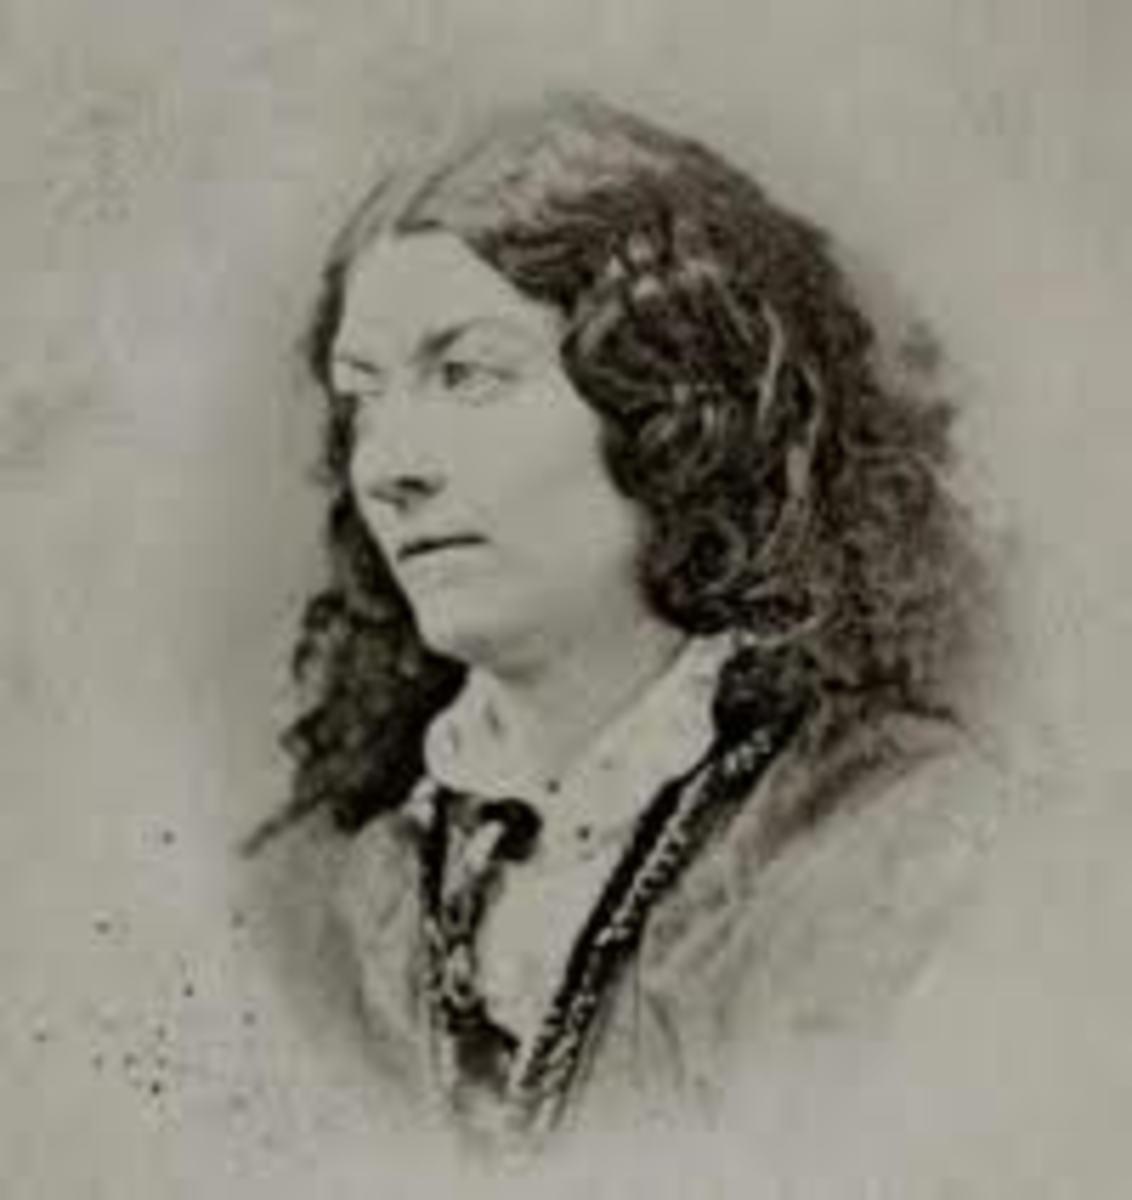 Lola Montez in her later life.